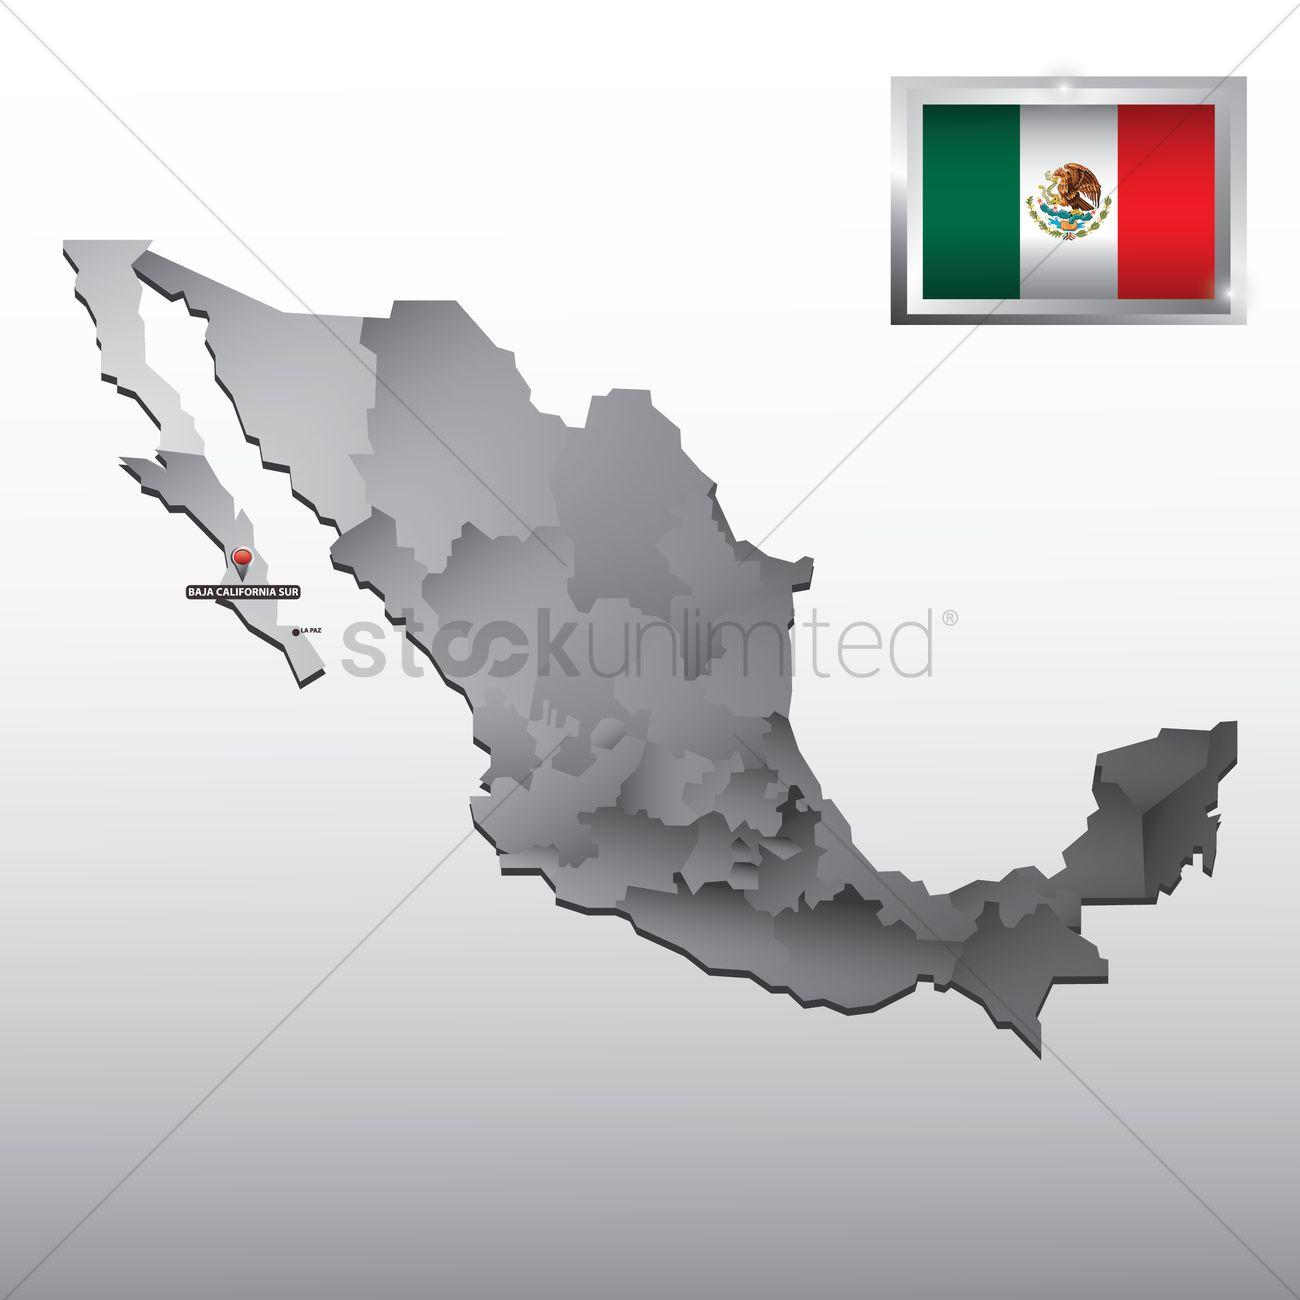 Navigation Pointer Indicating Baja California Sur On Mexico Map